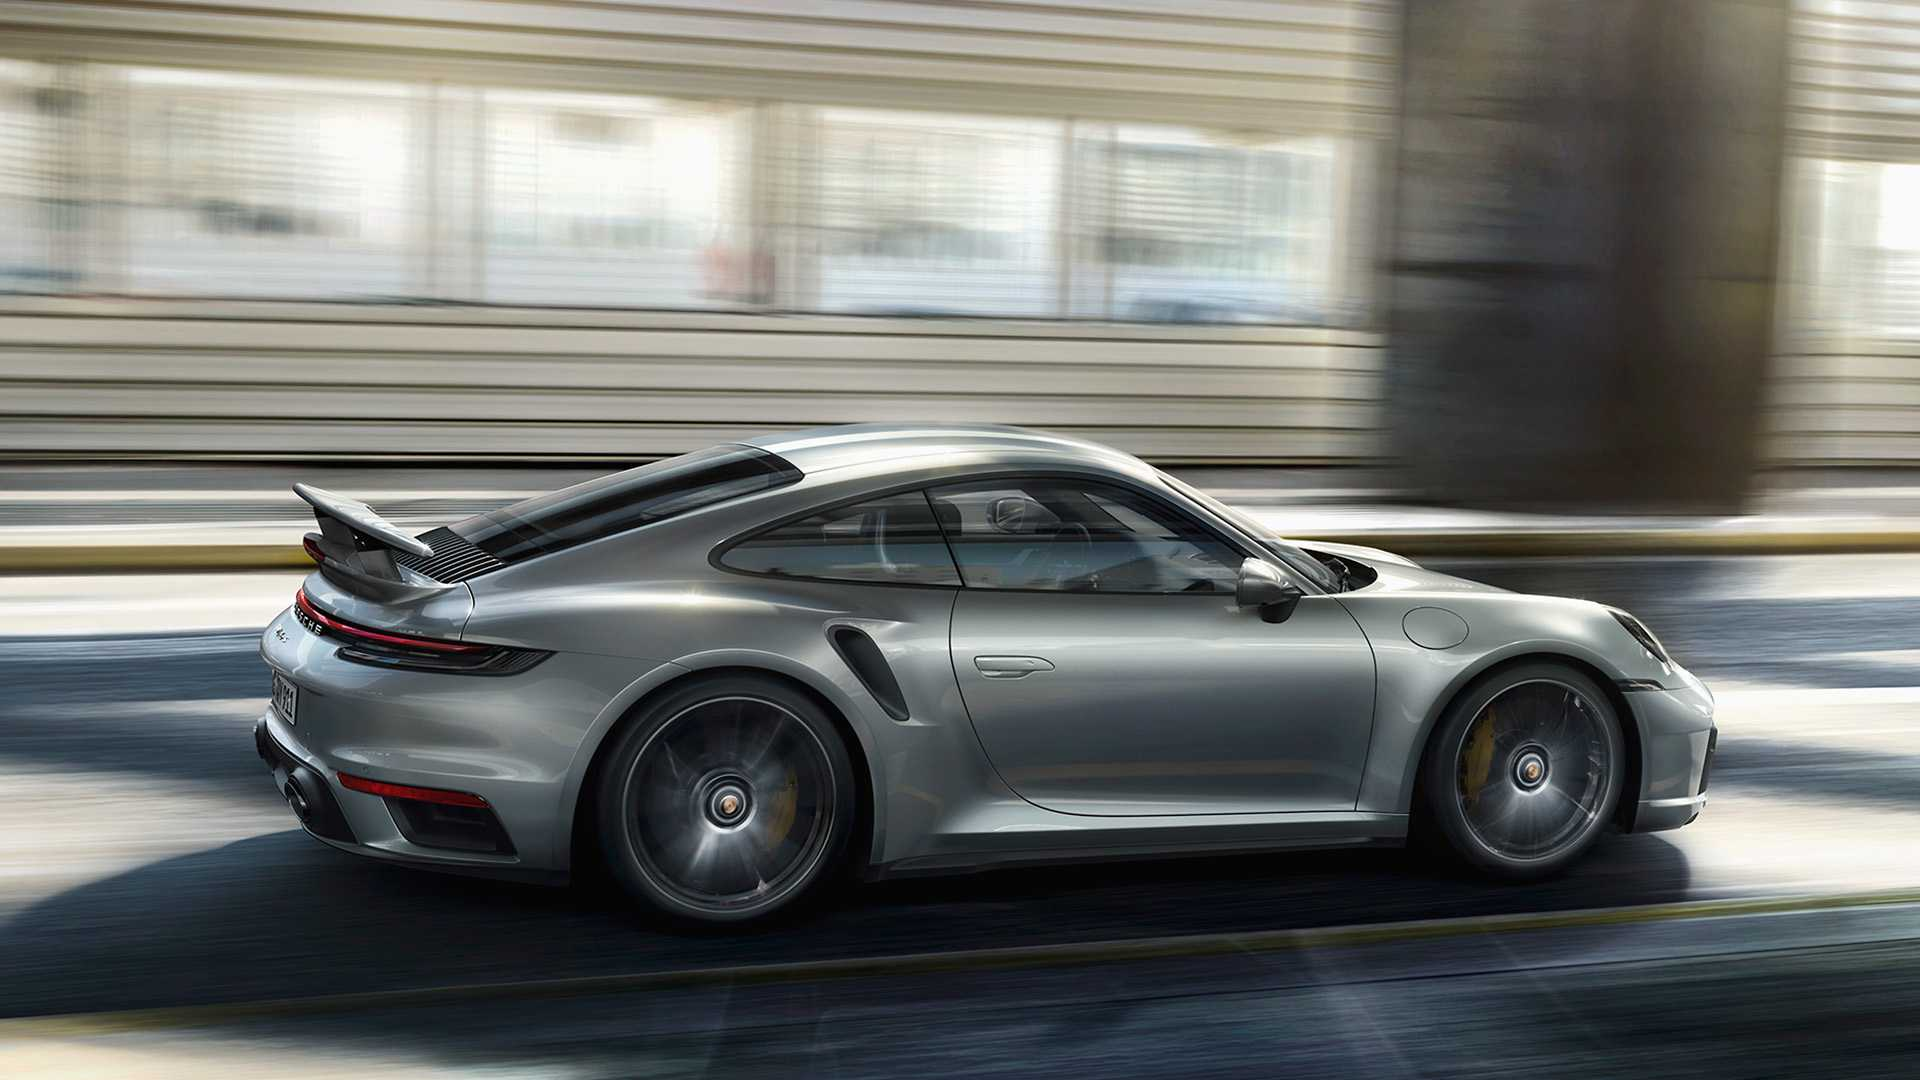 2020 Porsche 911 Performance and New Engine